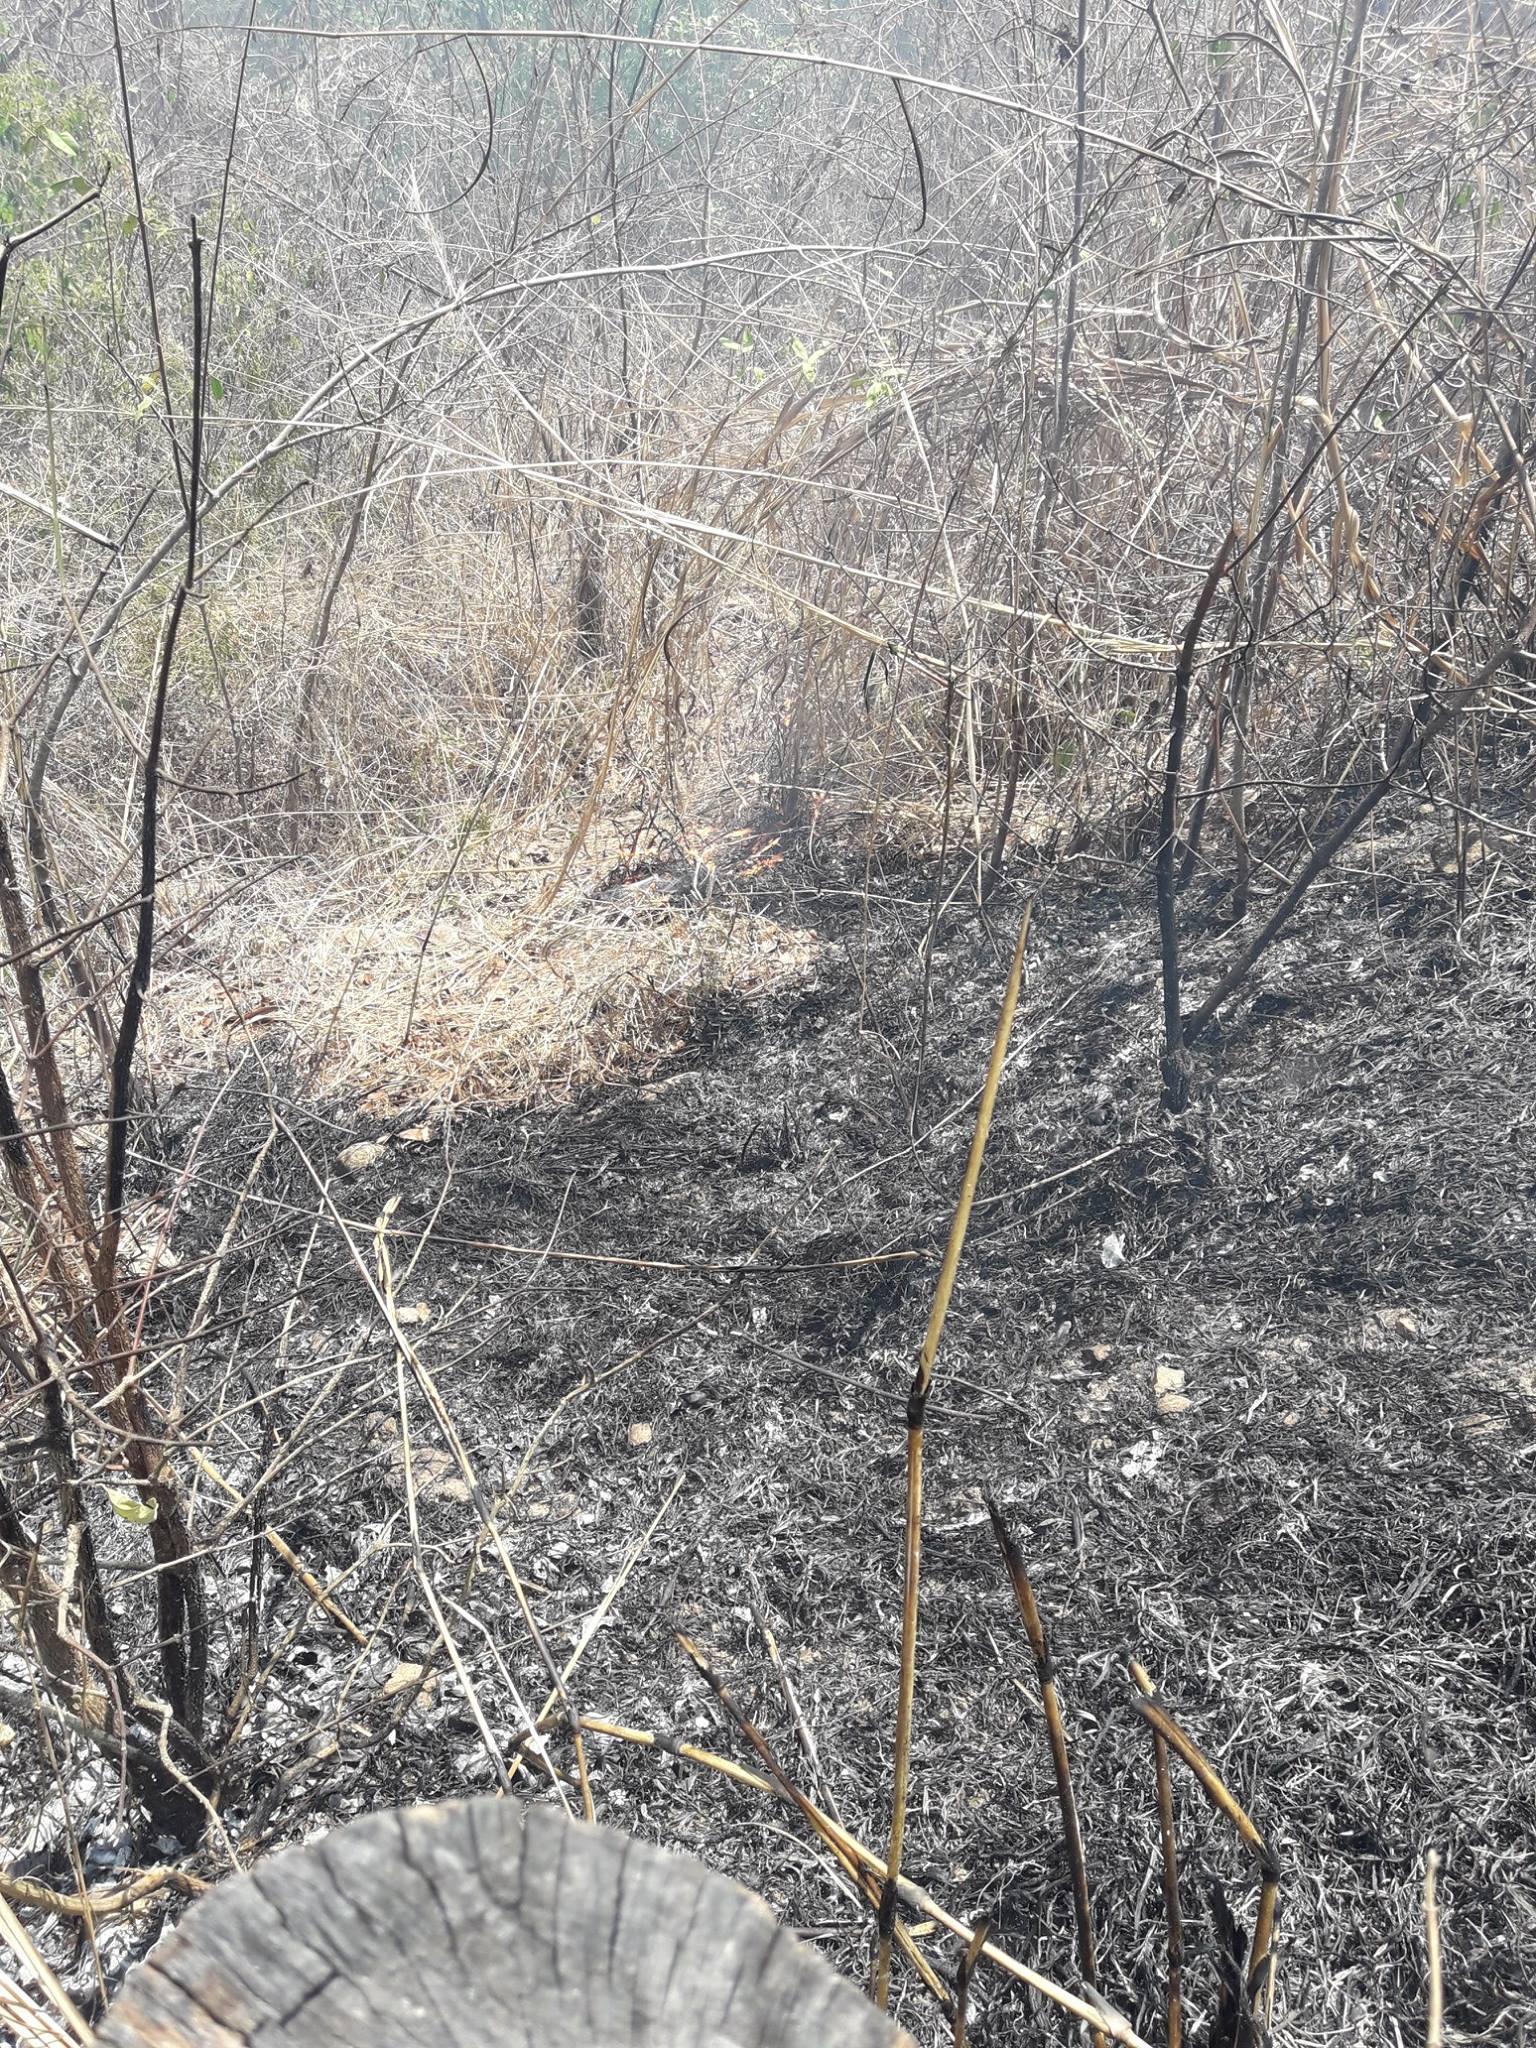 Continúan incendios de maleza seca en el municipio de Metapán